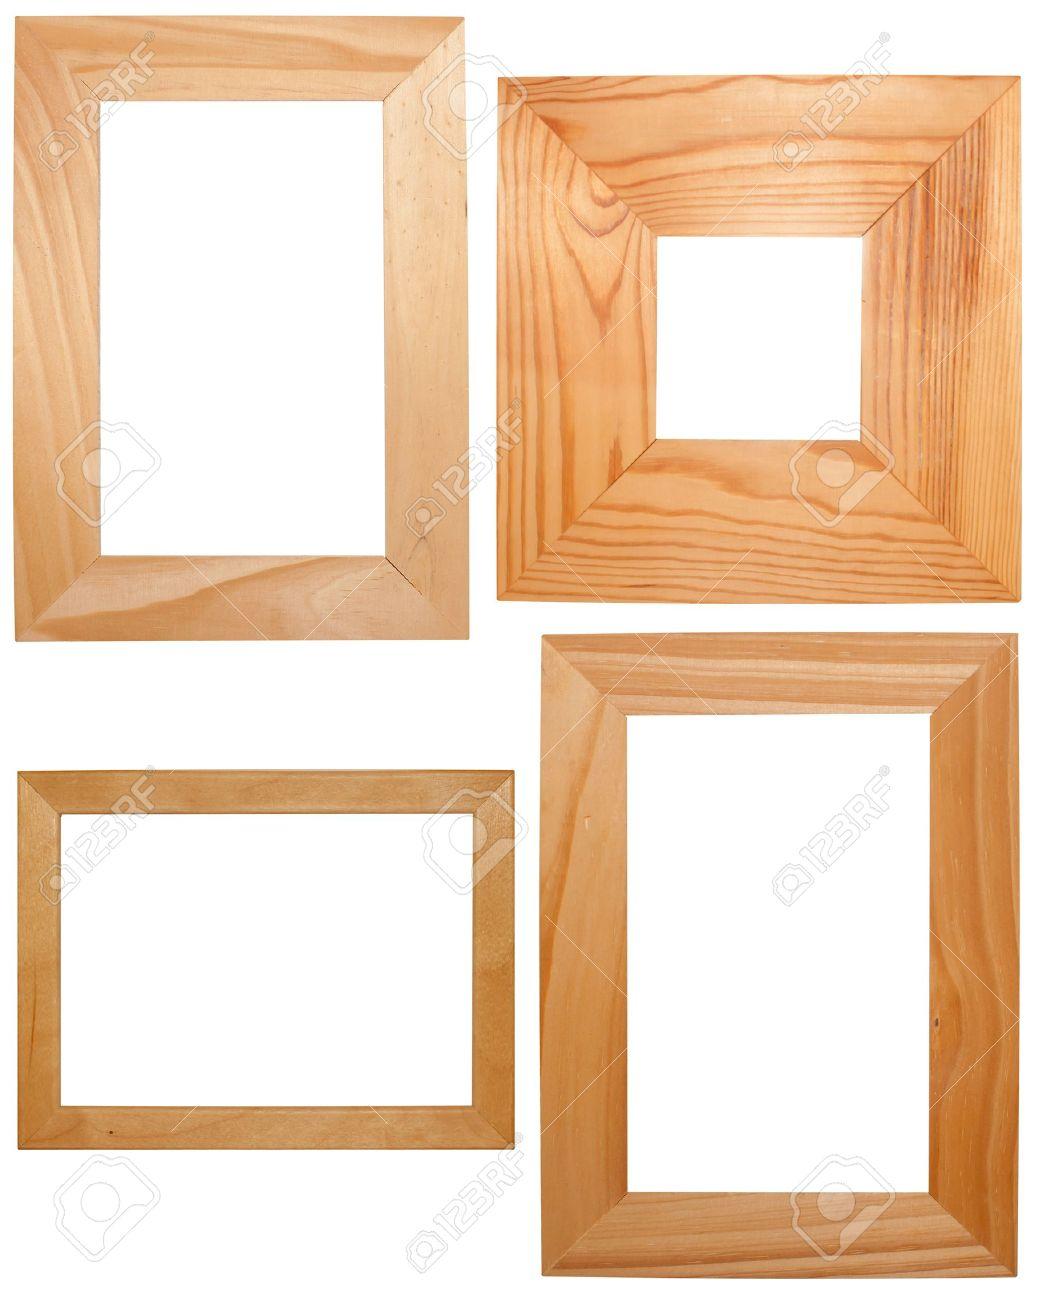 Fullsize Of Wooden Picture Frames